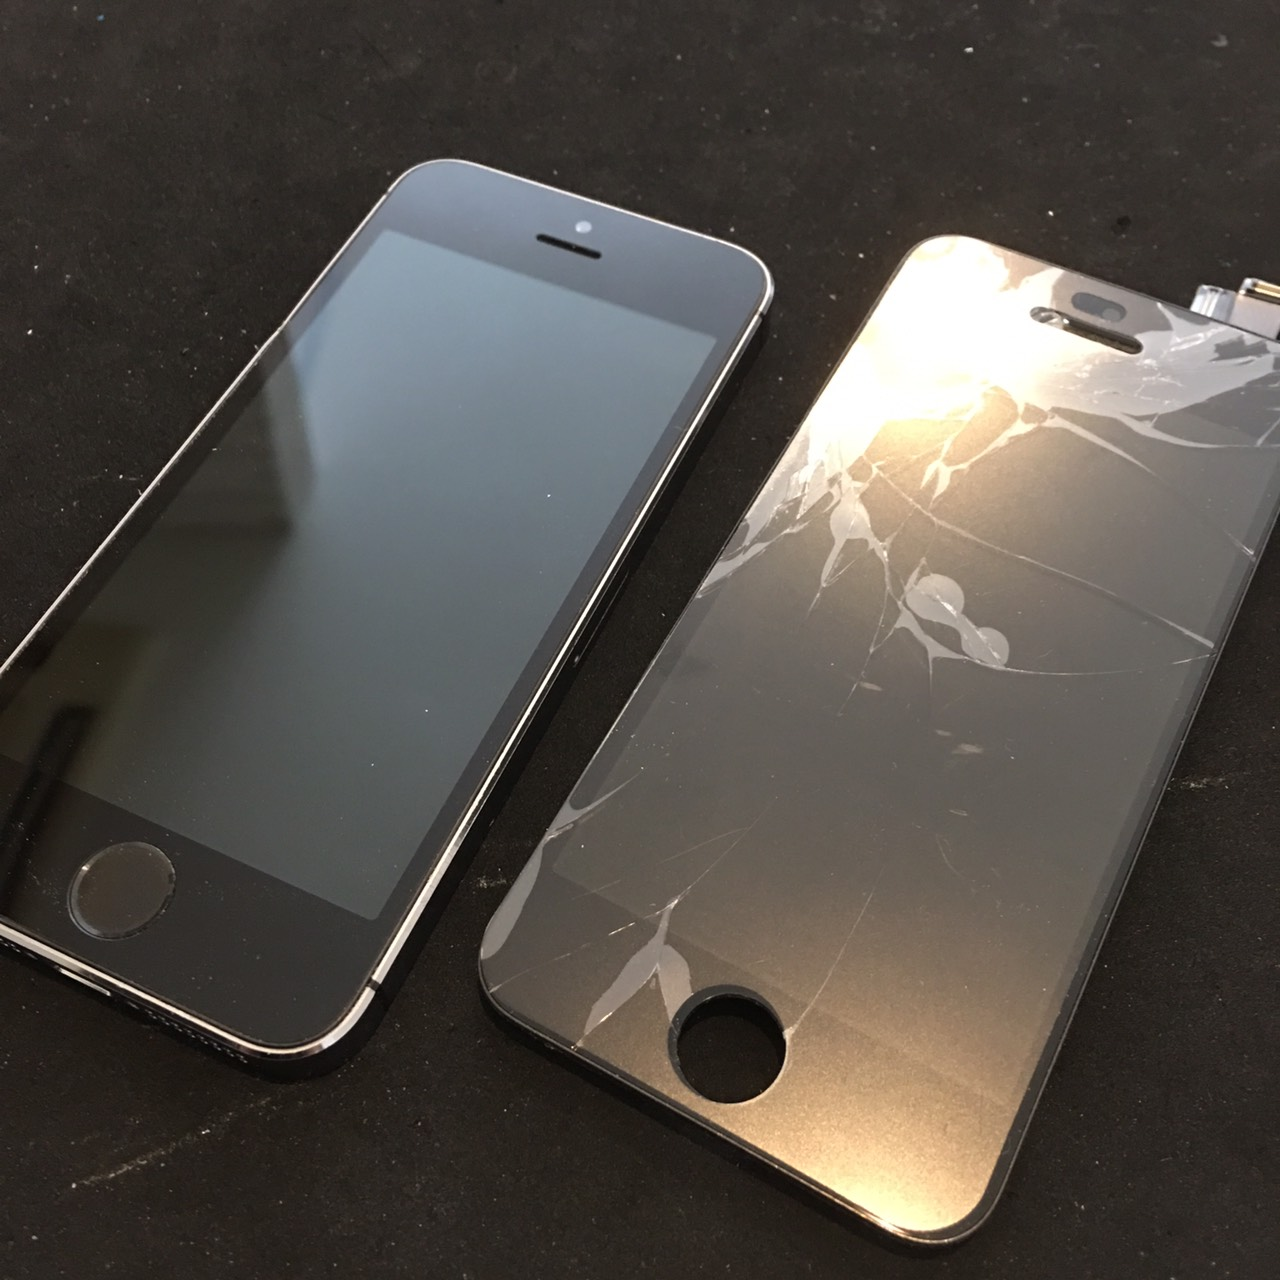 0611|iPhone6|液晶パネル交換修理